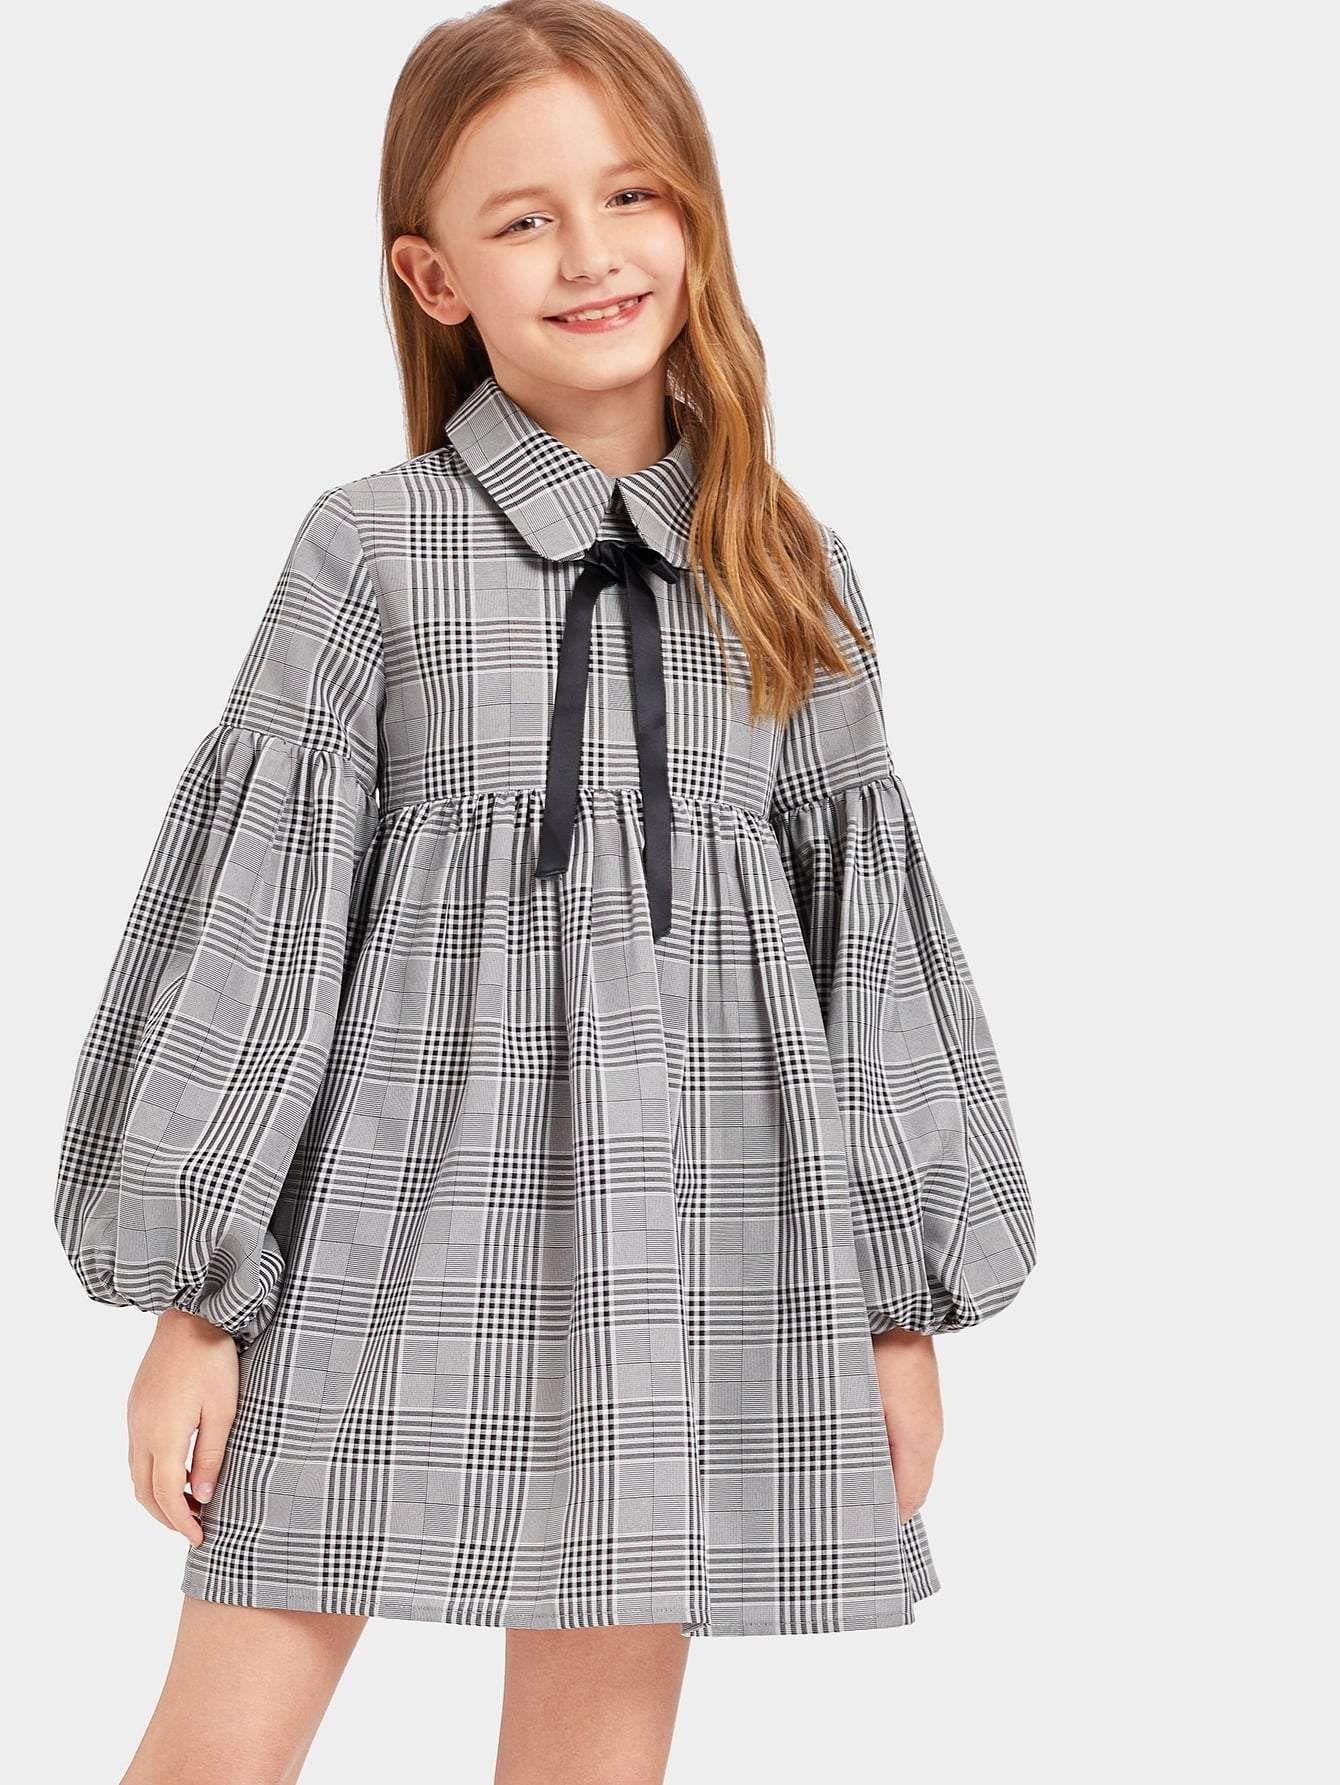 Girls Zip Back Lantern Sleeve Plaid Dress